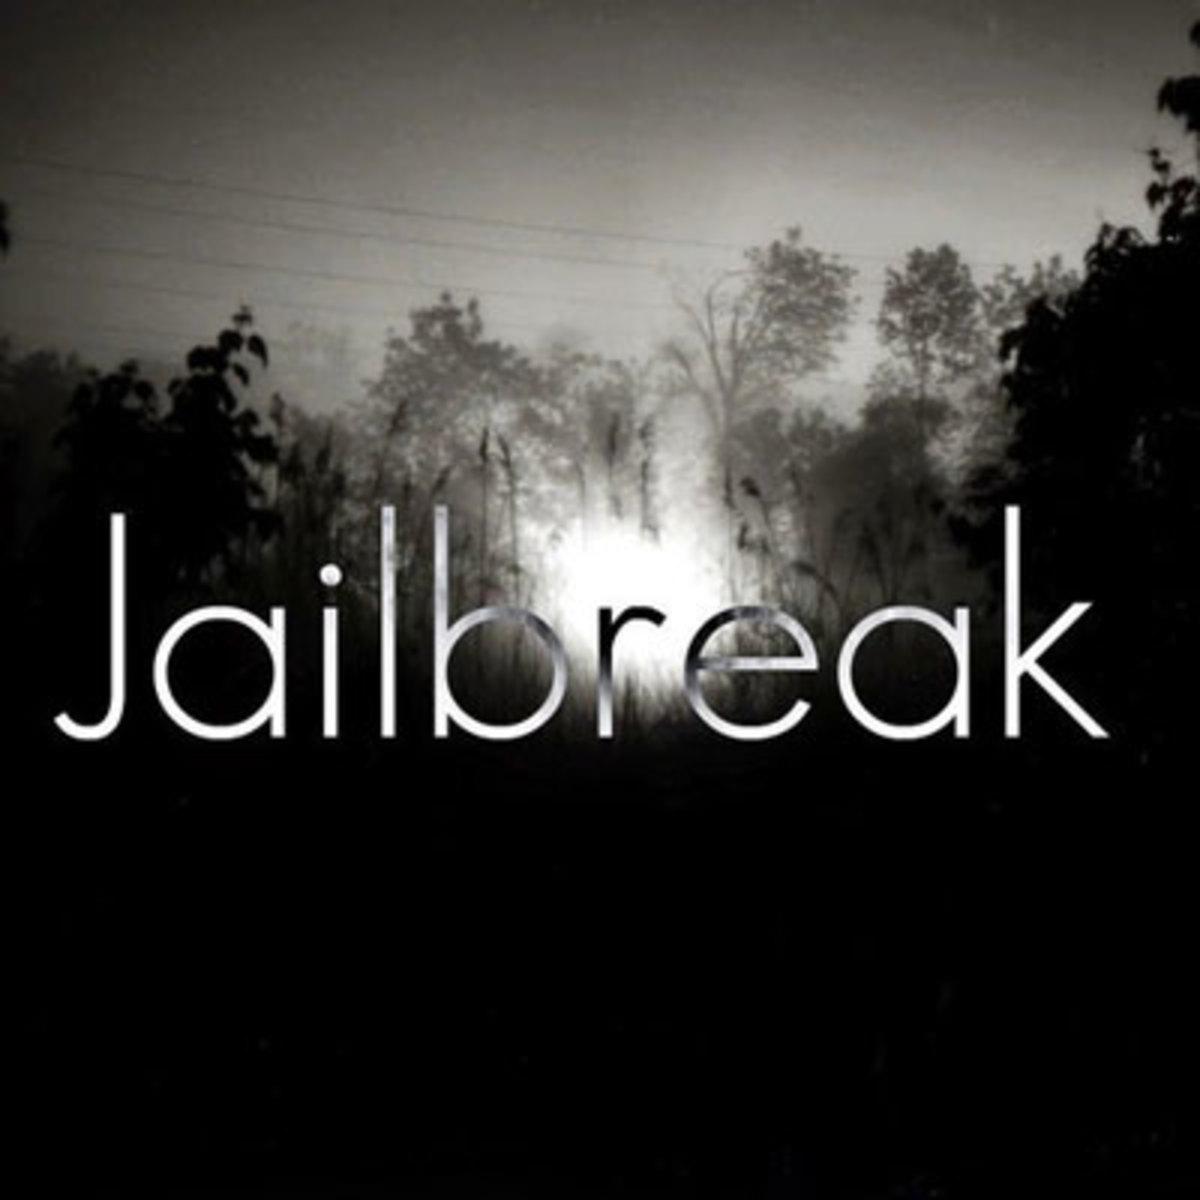 edubble-jailbreak.jpg